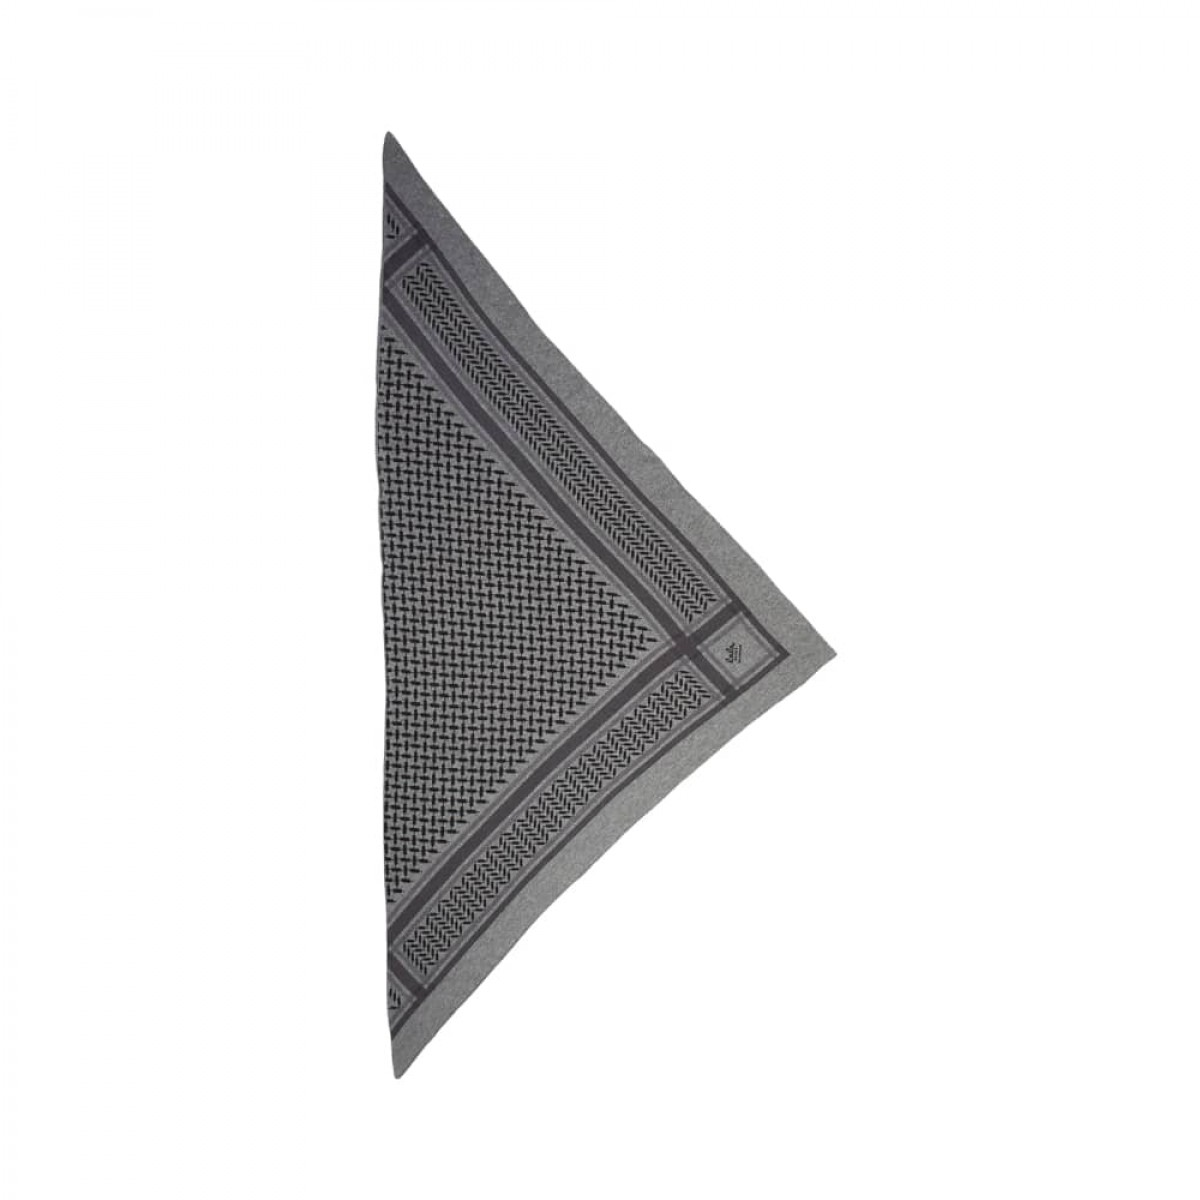 triangle trinity classic m - city middlegrey melange - 4